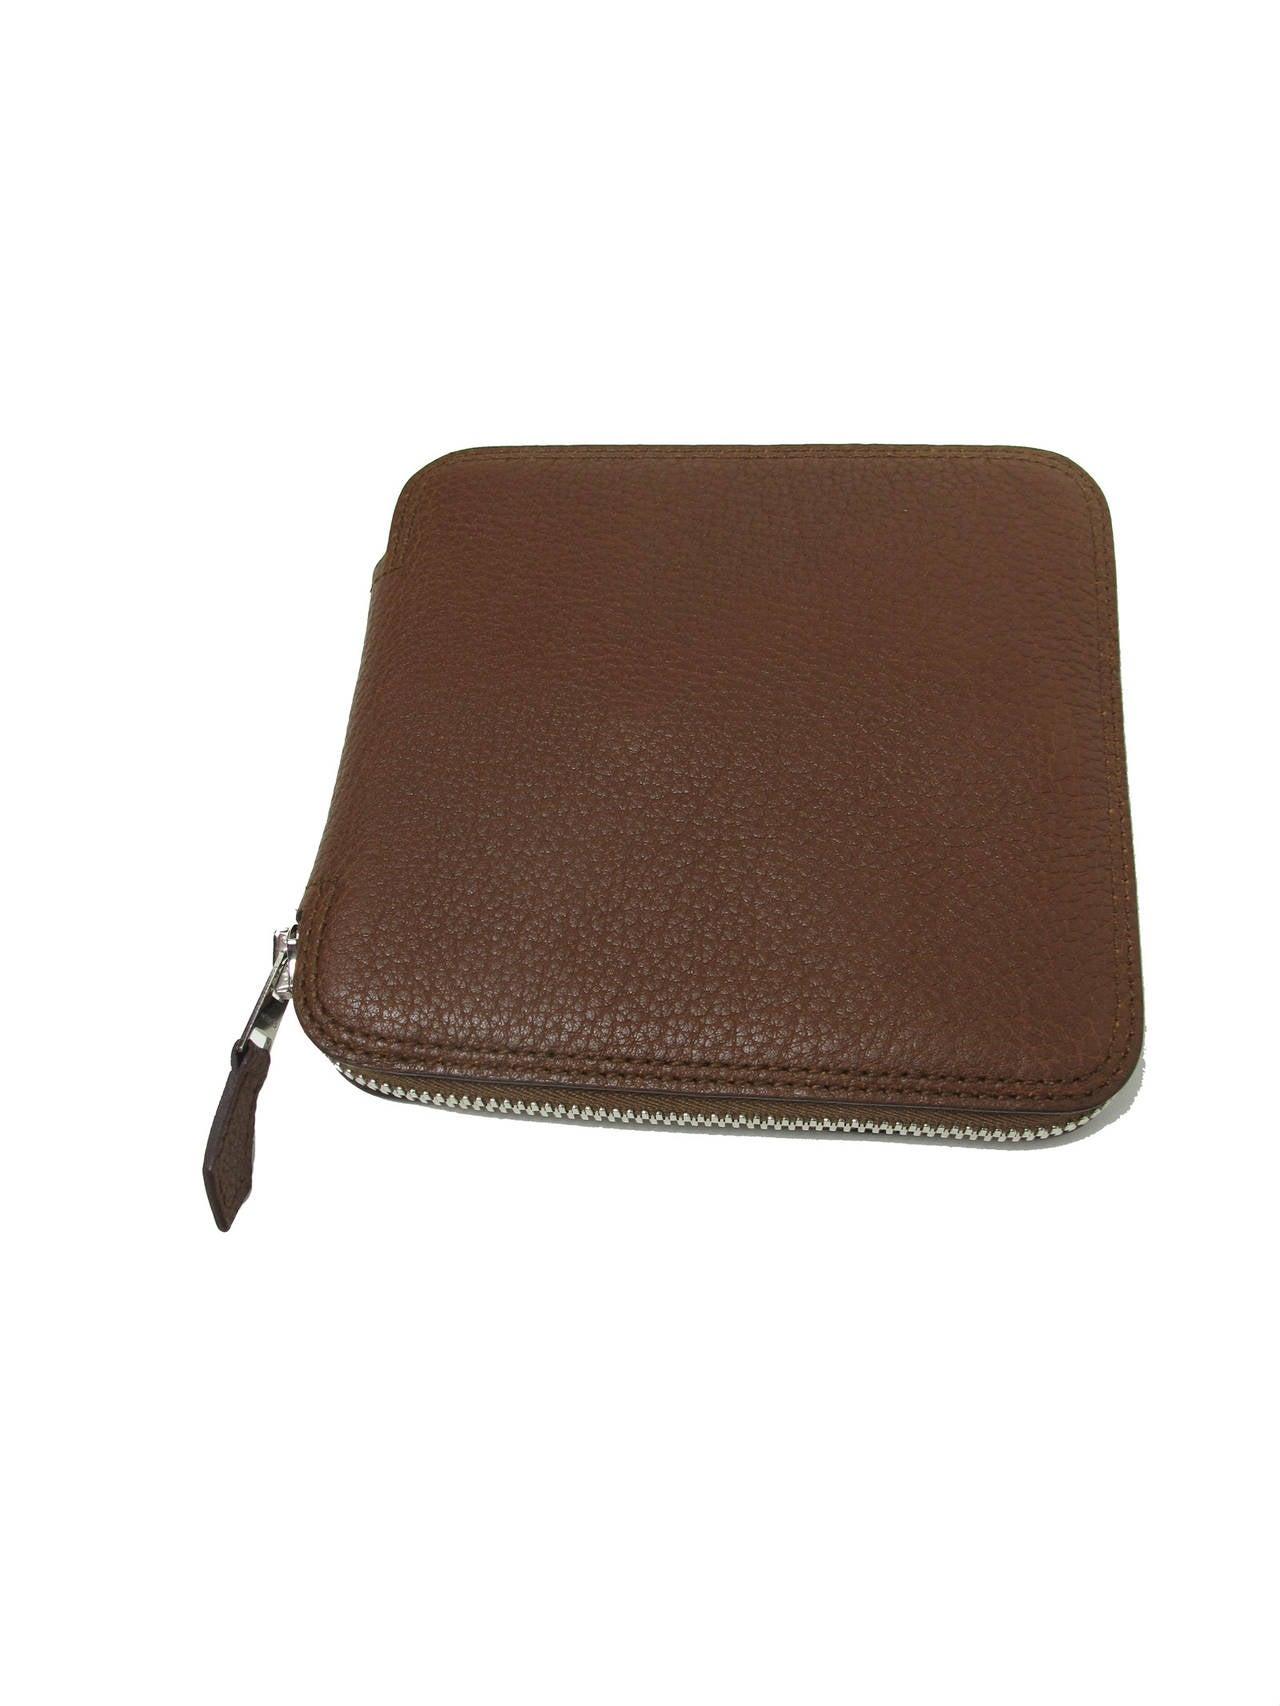 Rare Hermes Orange H Shopper Tote Collapsible Zip Handbag - sale 2